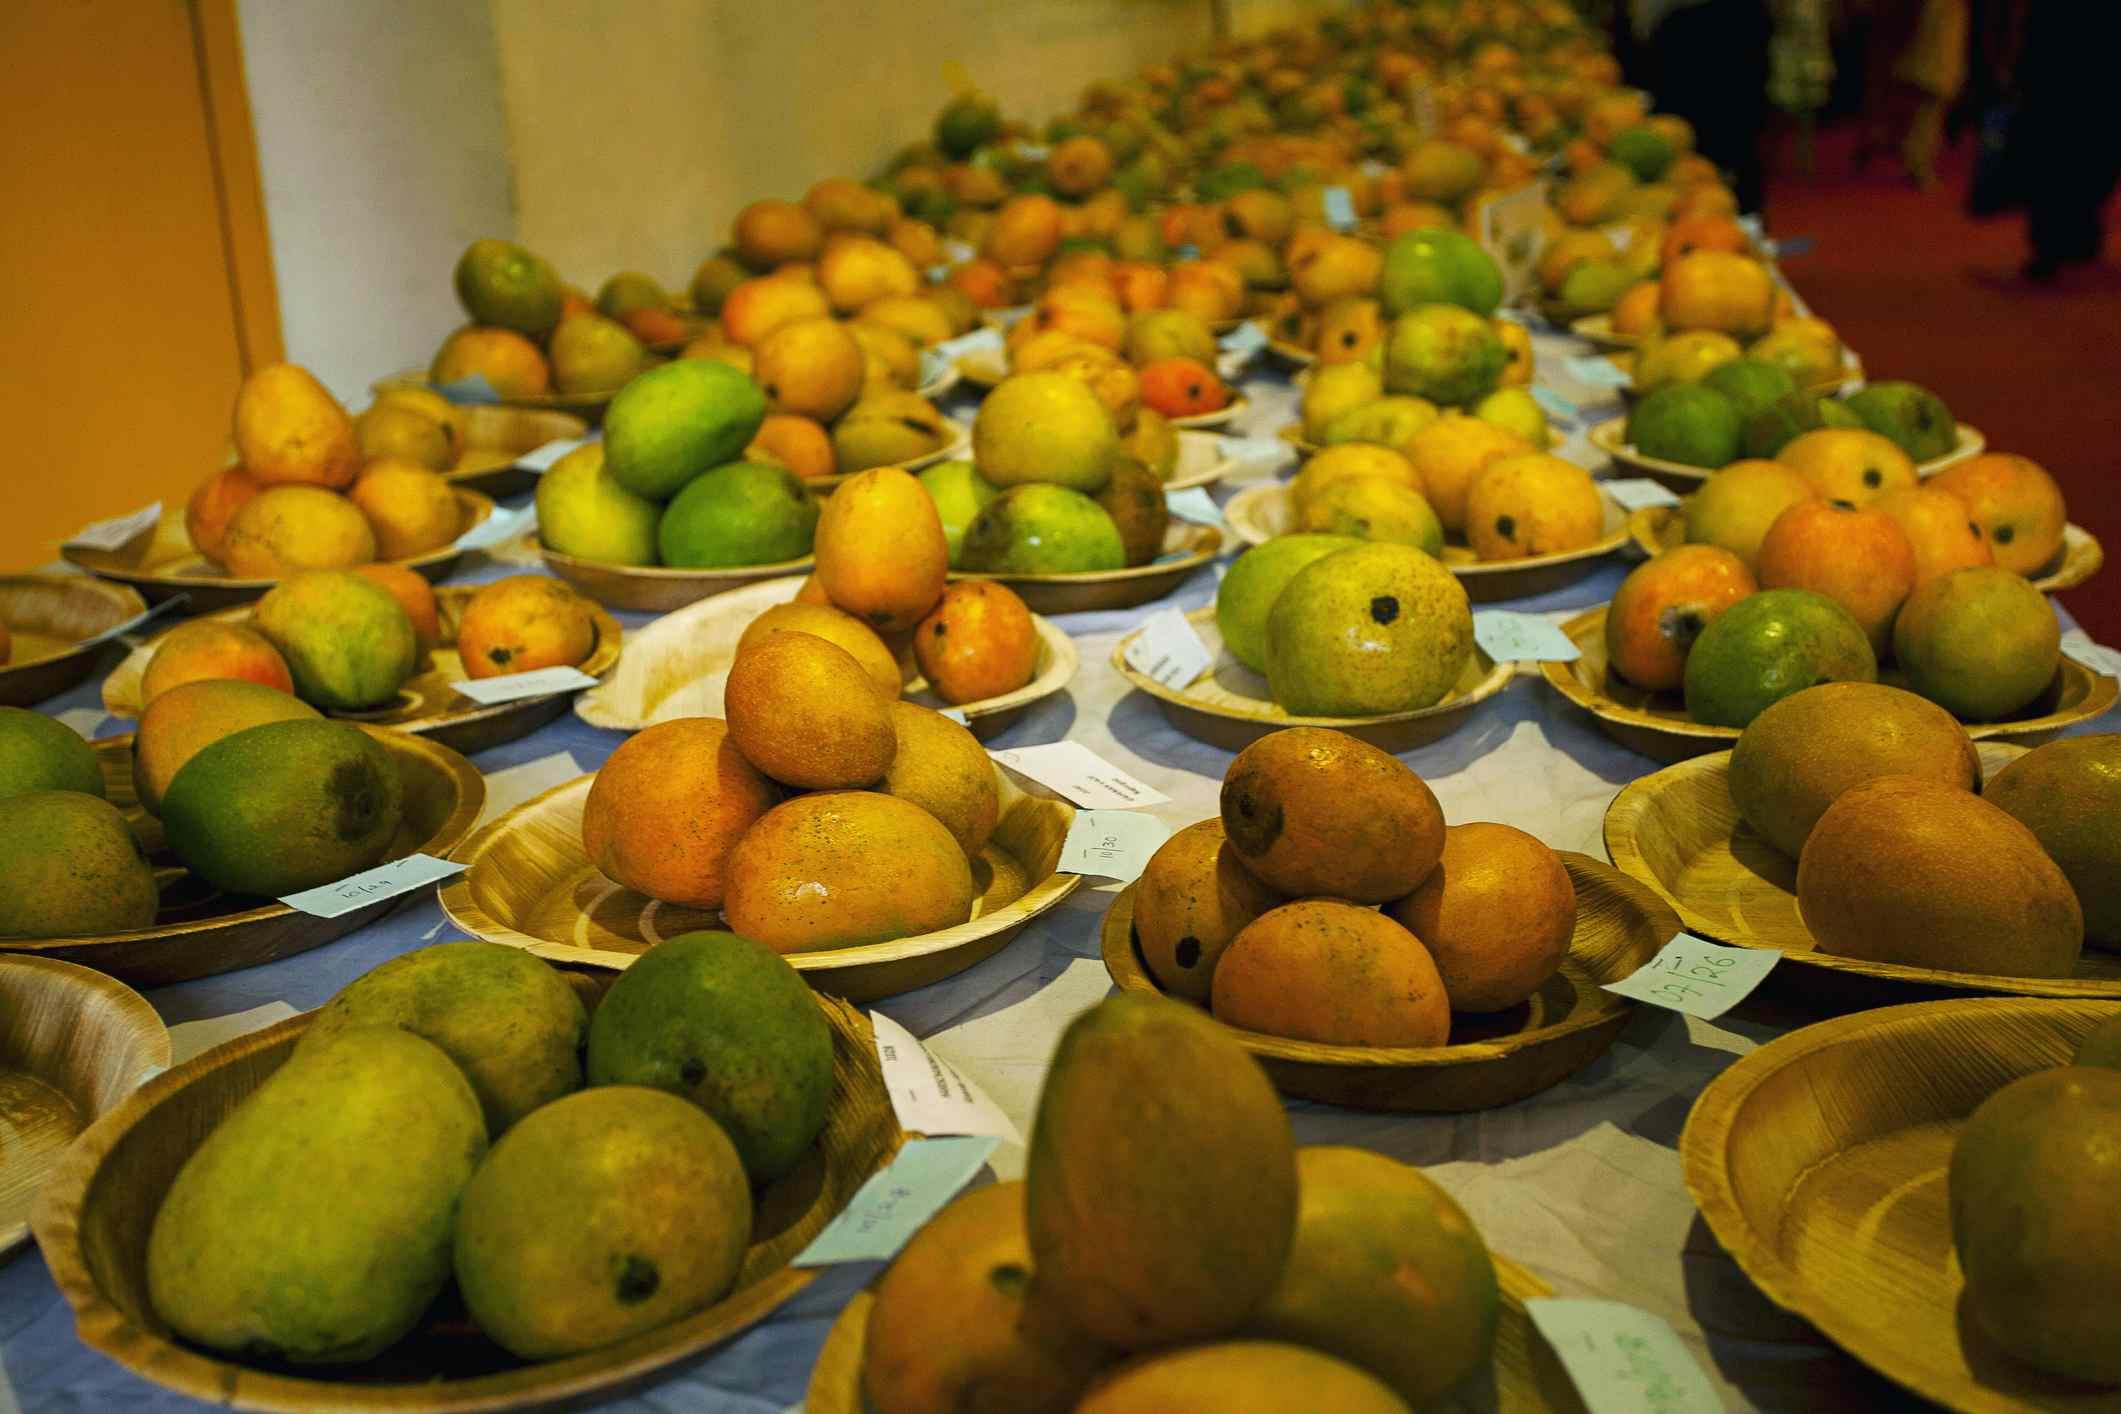 Mangoes on display.